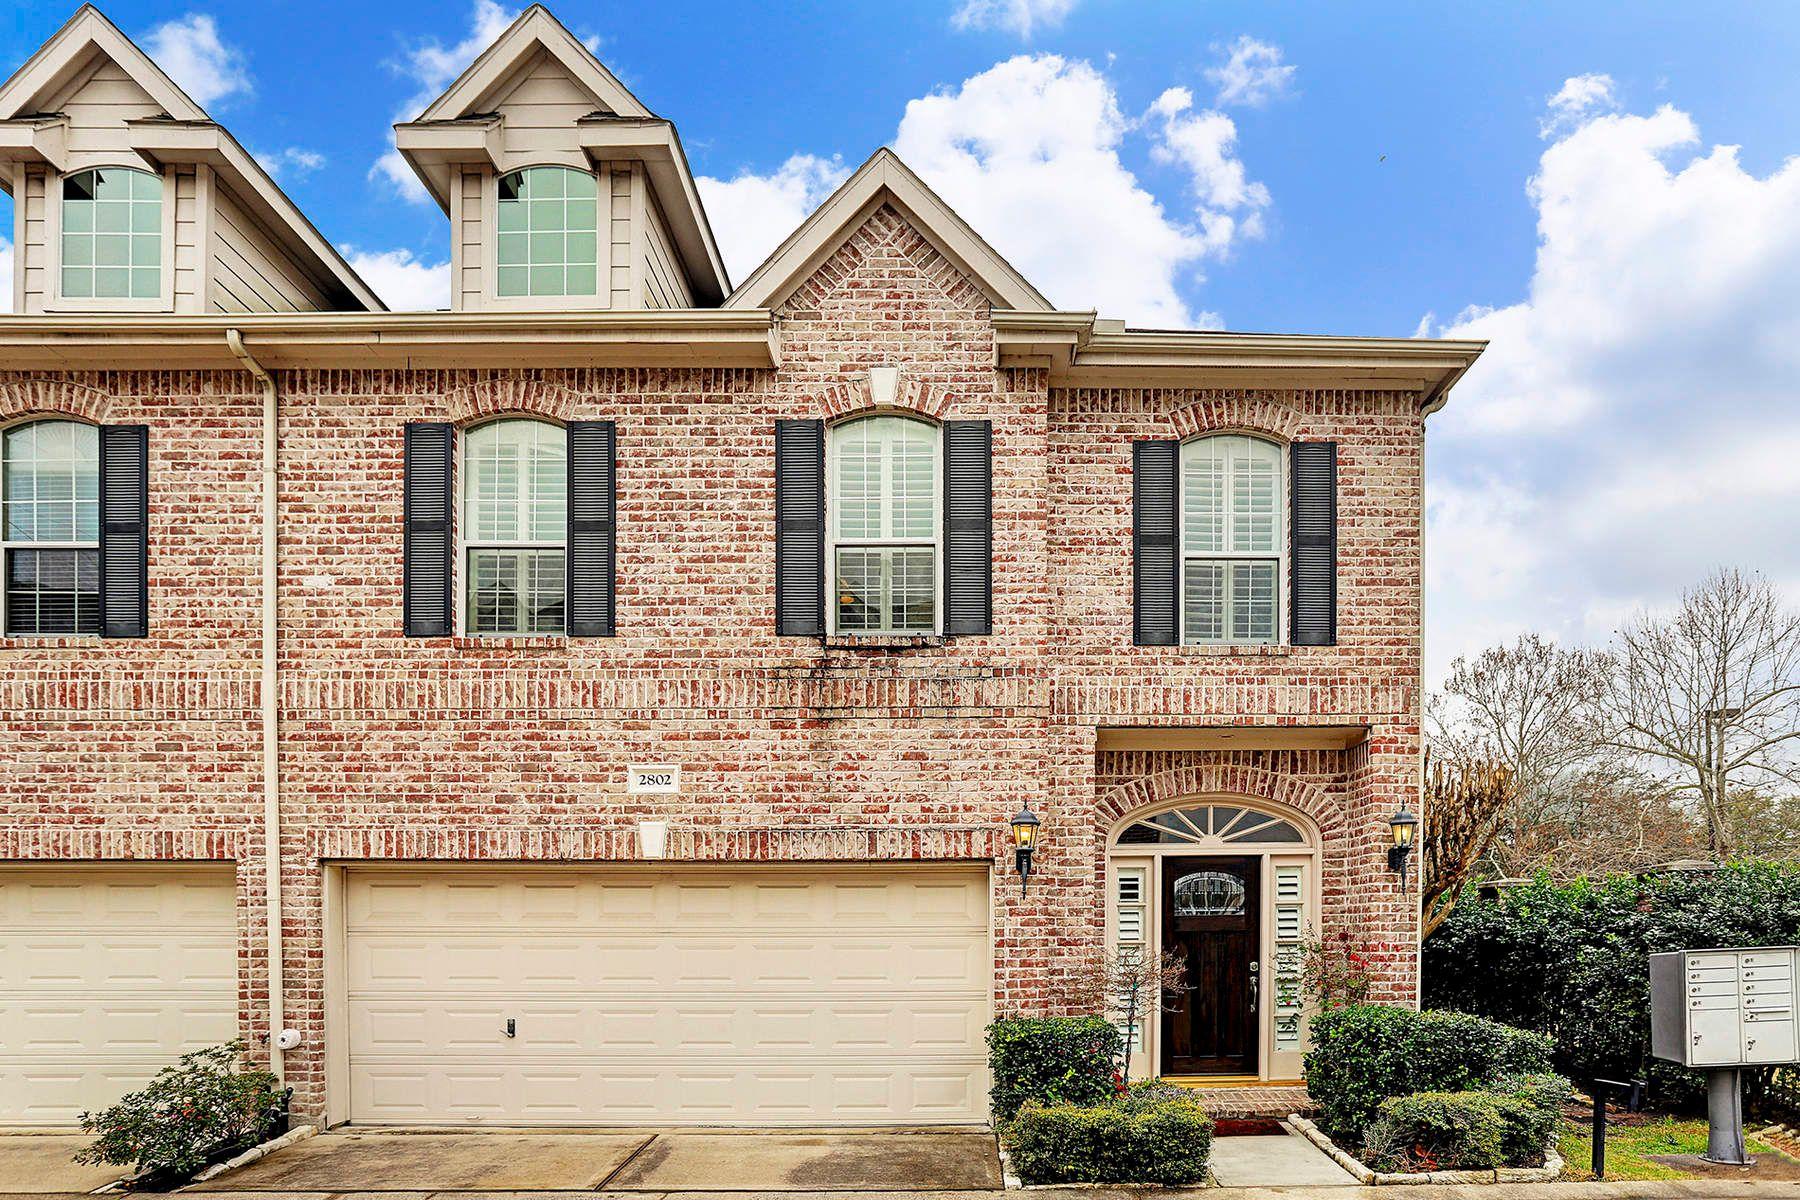 شقة بعمارة للـ Sale في 2802 Val Verde Court Houston, Texas, 77057 United States